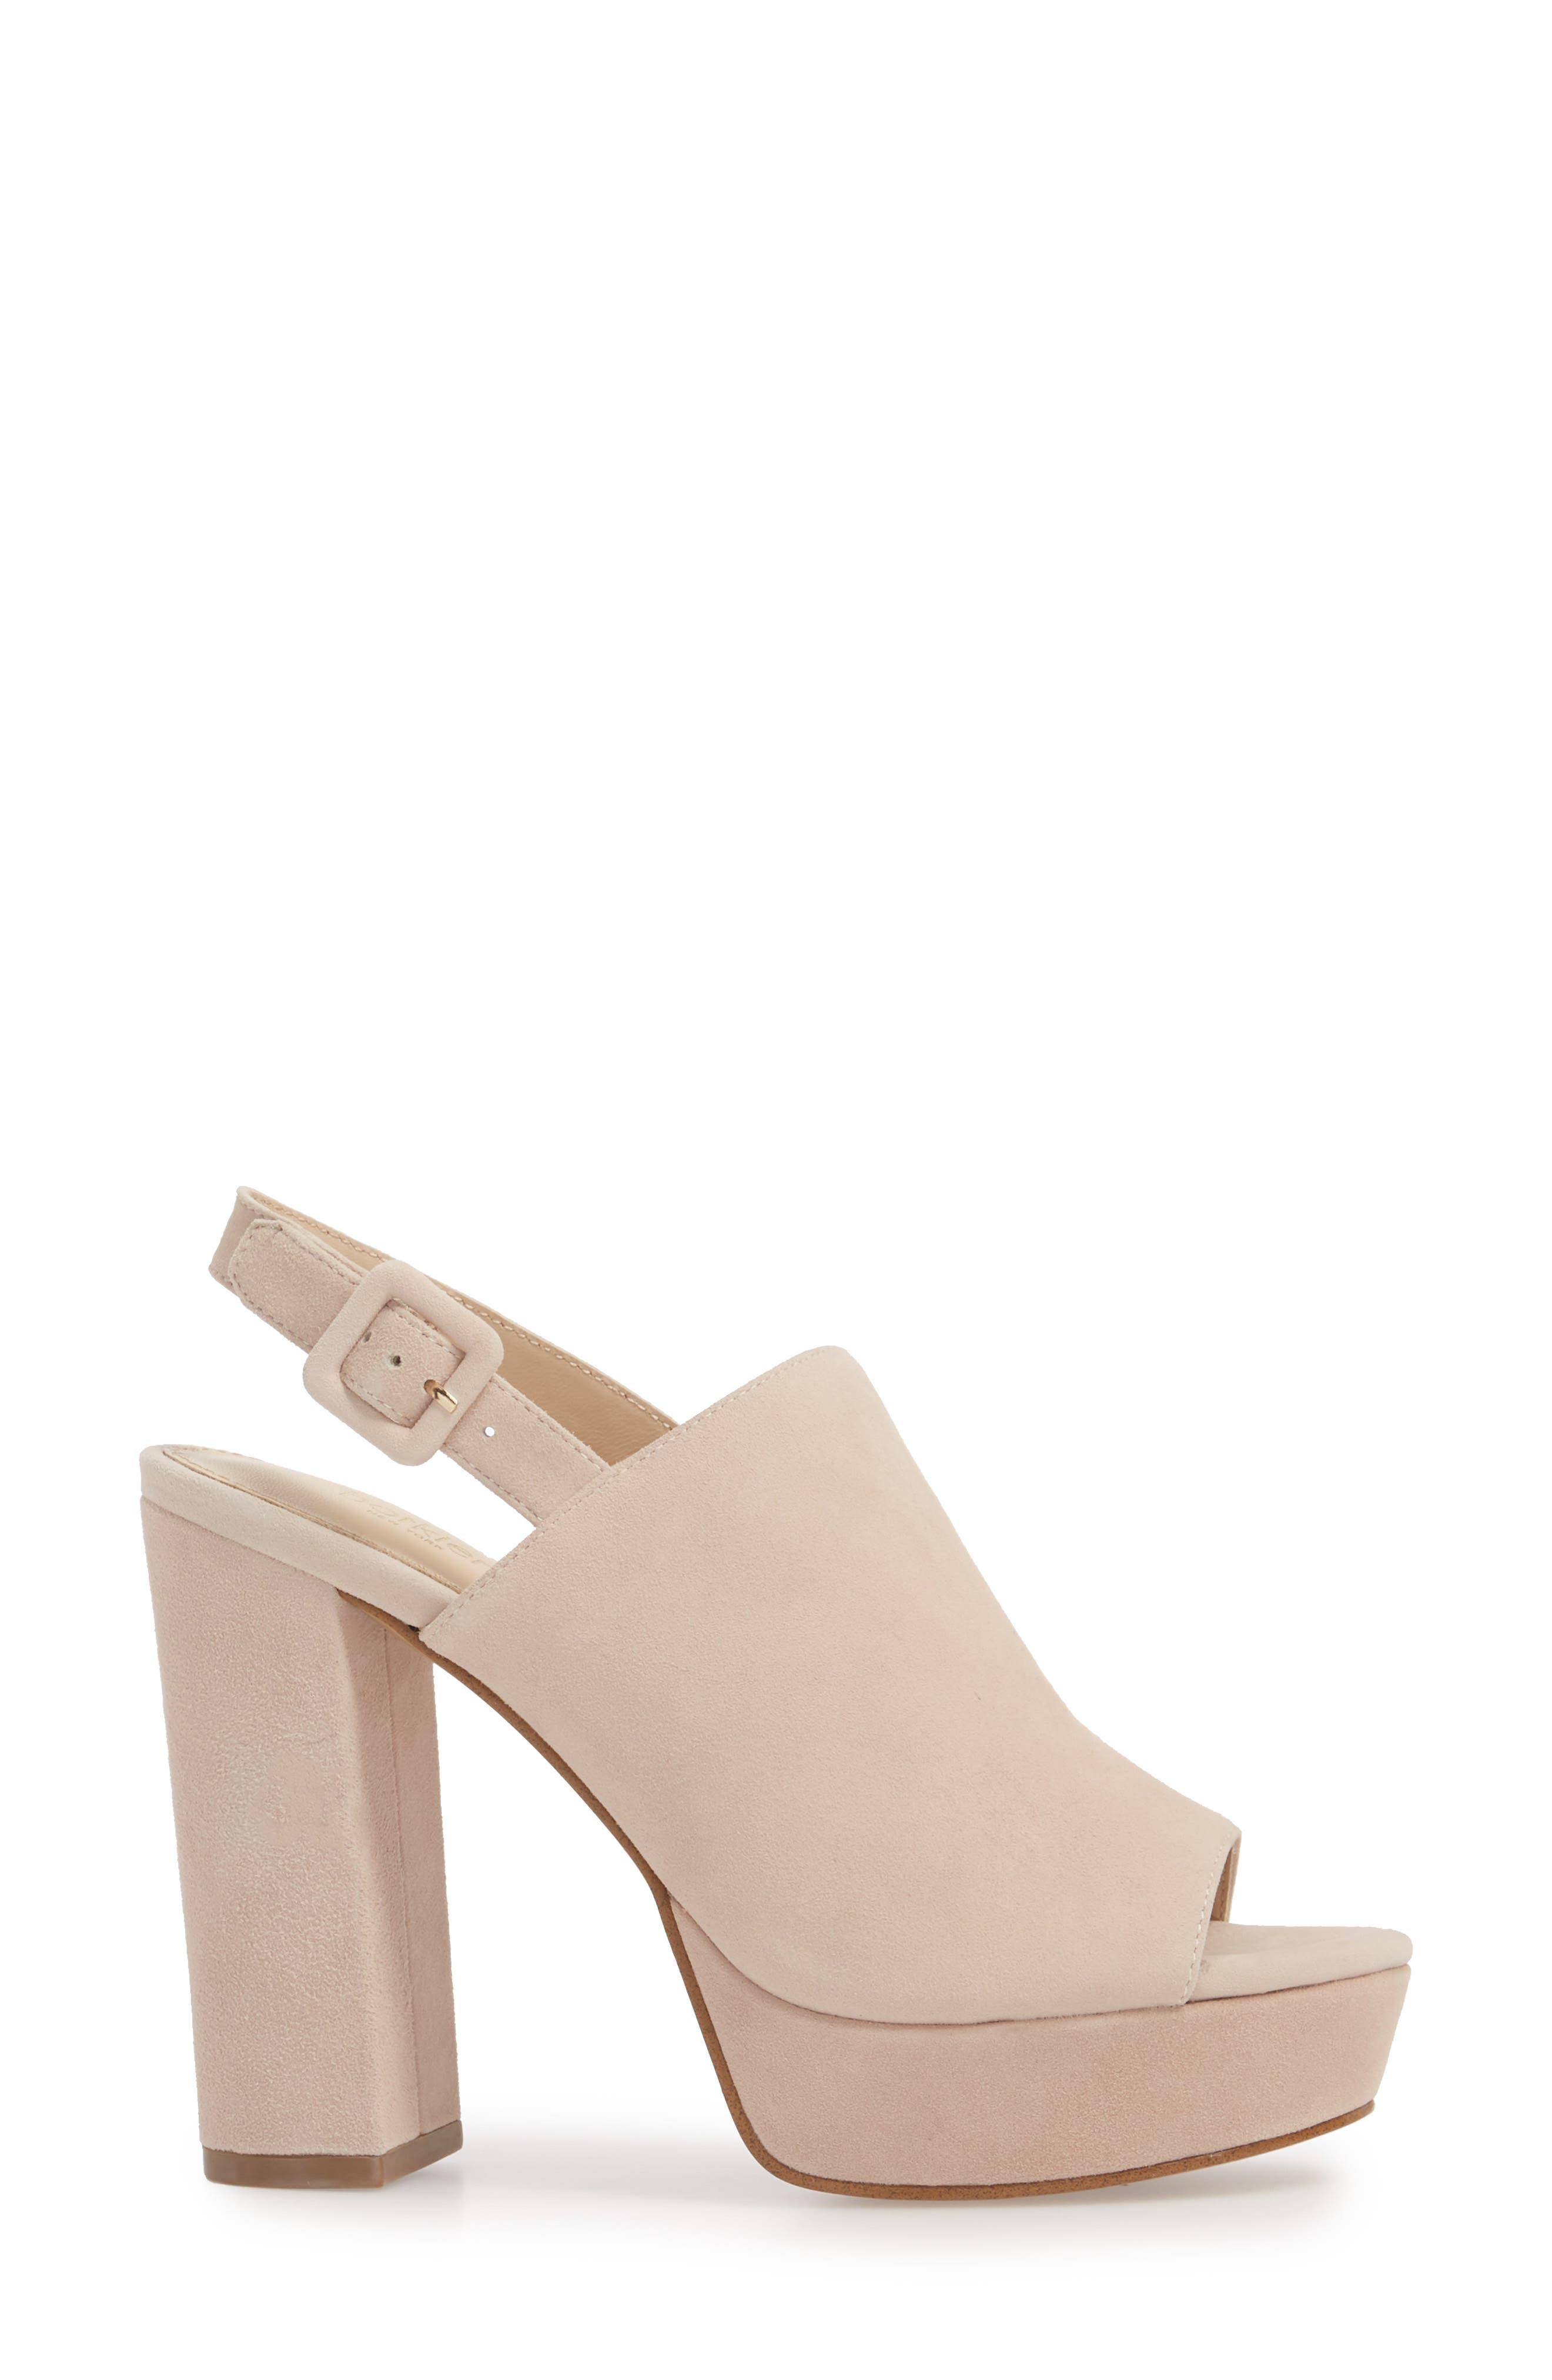 Jolene Platform Sandal,                             Alternate thumbnail 3, color,                             Blush Suede